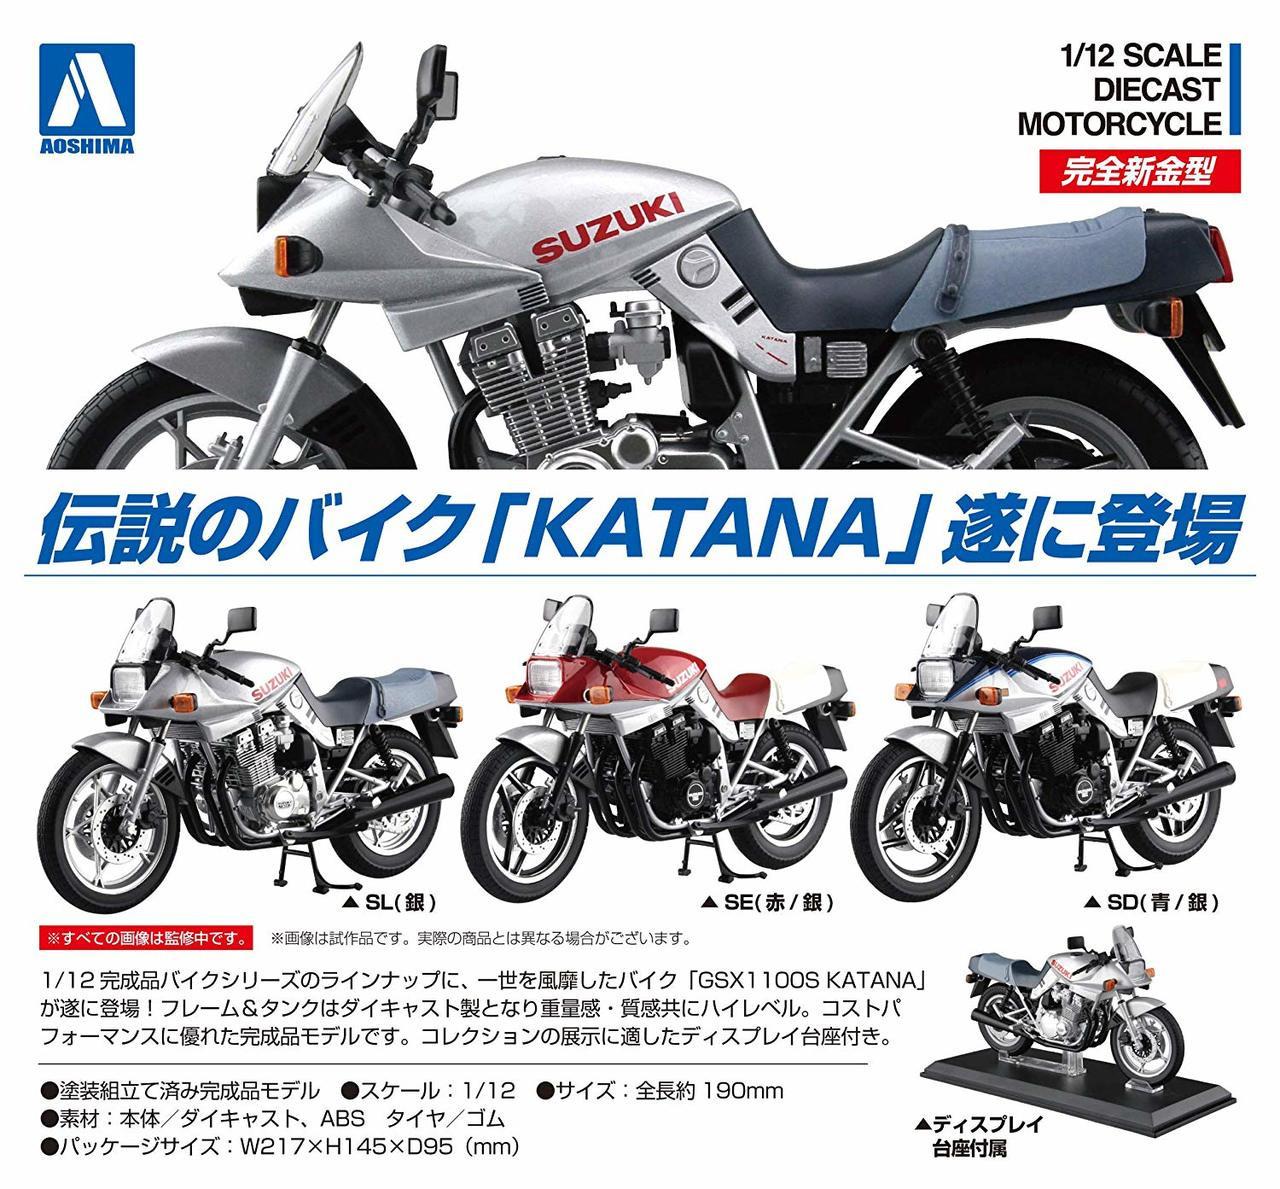 Skynet 1//12 finished product bike Suzuki GSX1100S KATANA SE red silver